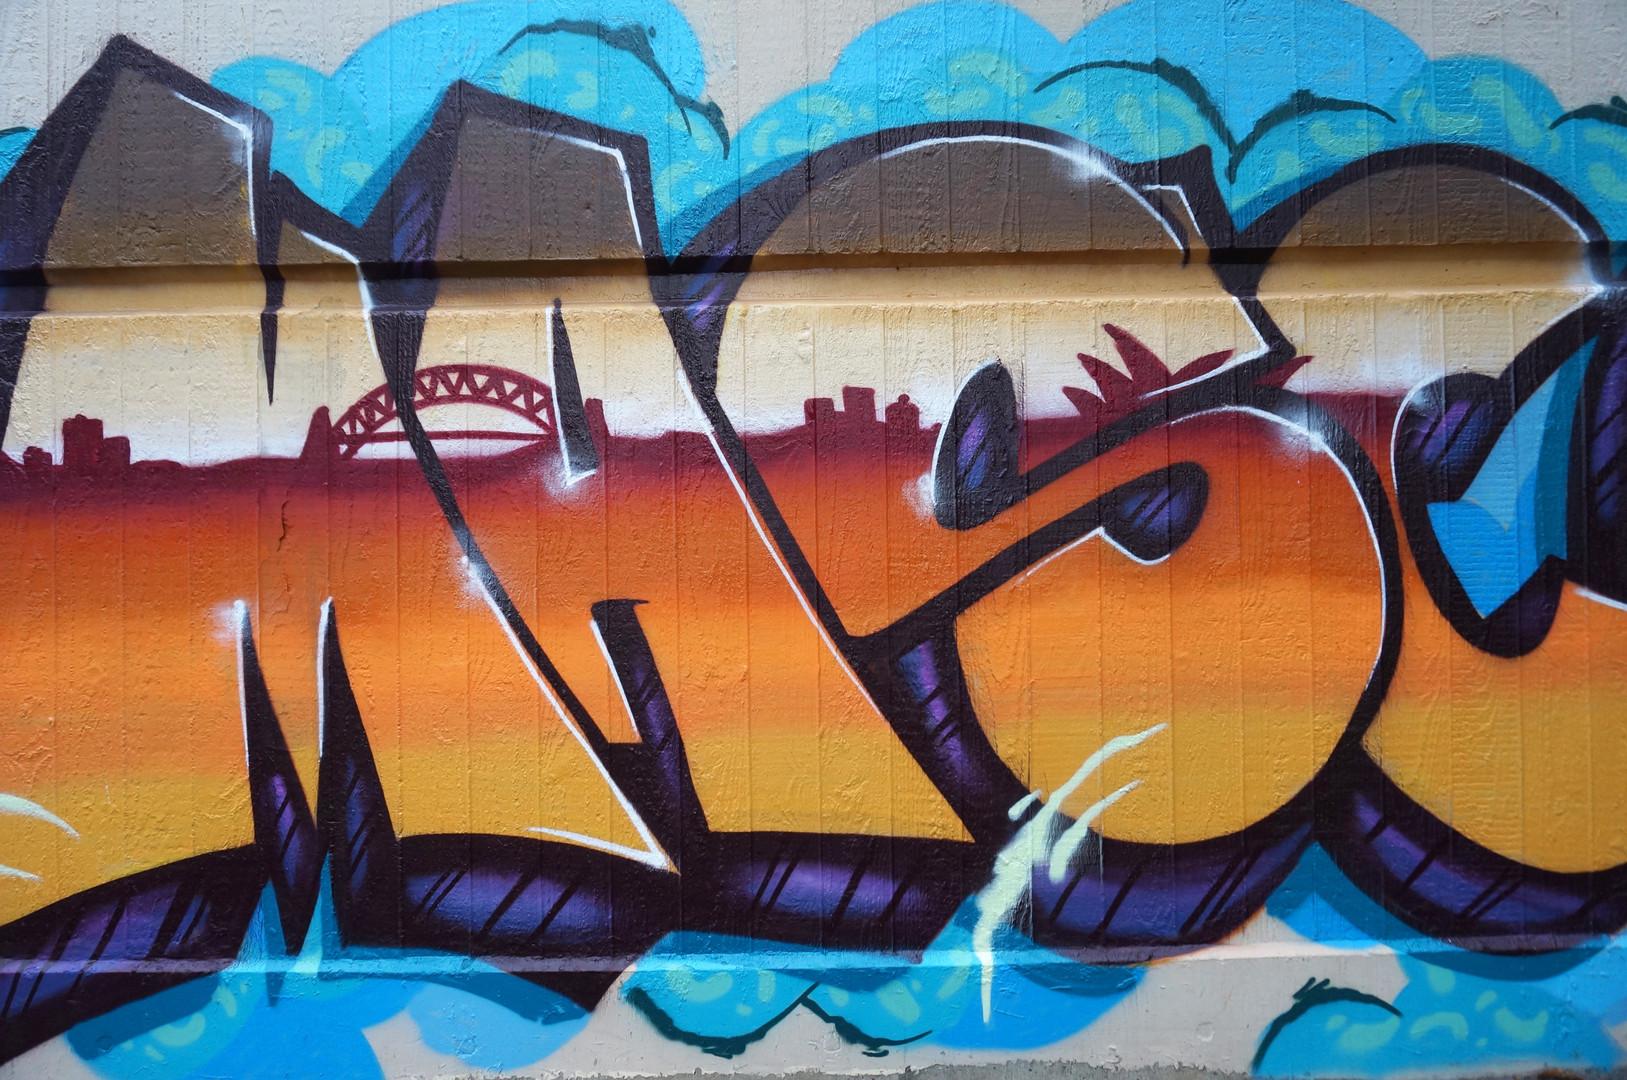 Graffiti Artist Sydney, Airplane Graffiti, Street Artist, Graffiti Lettering